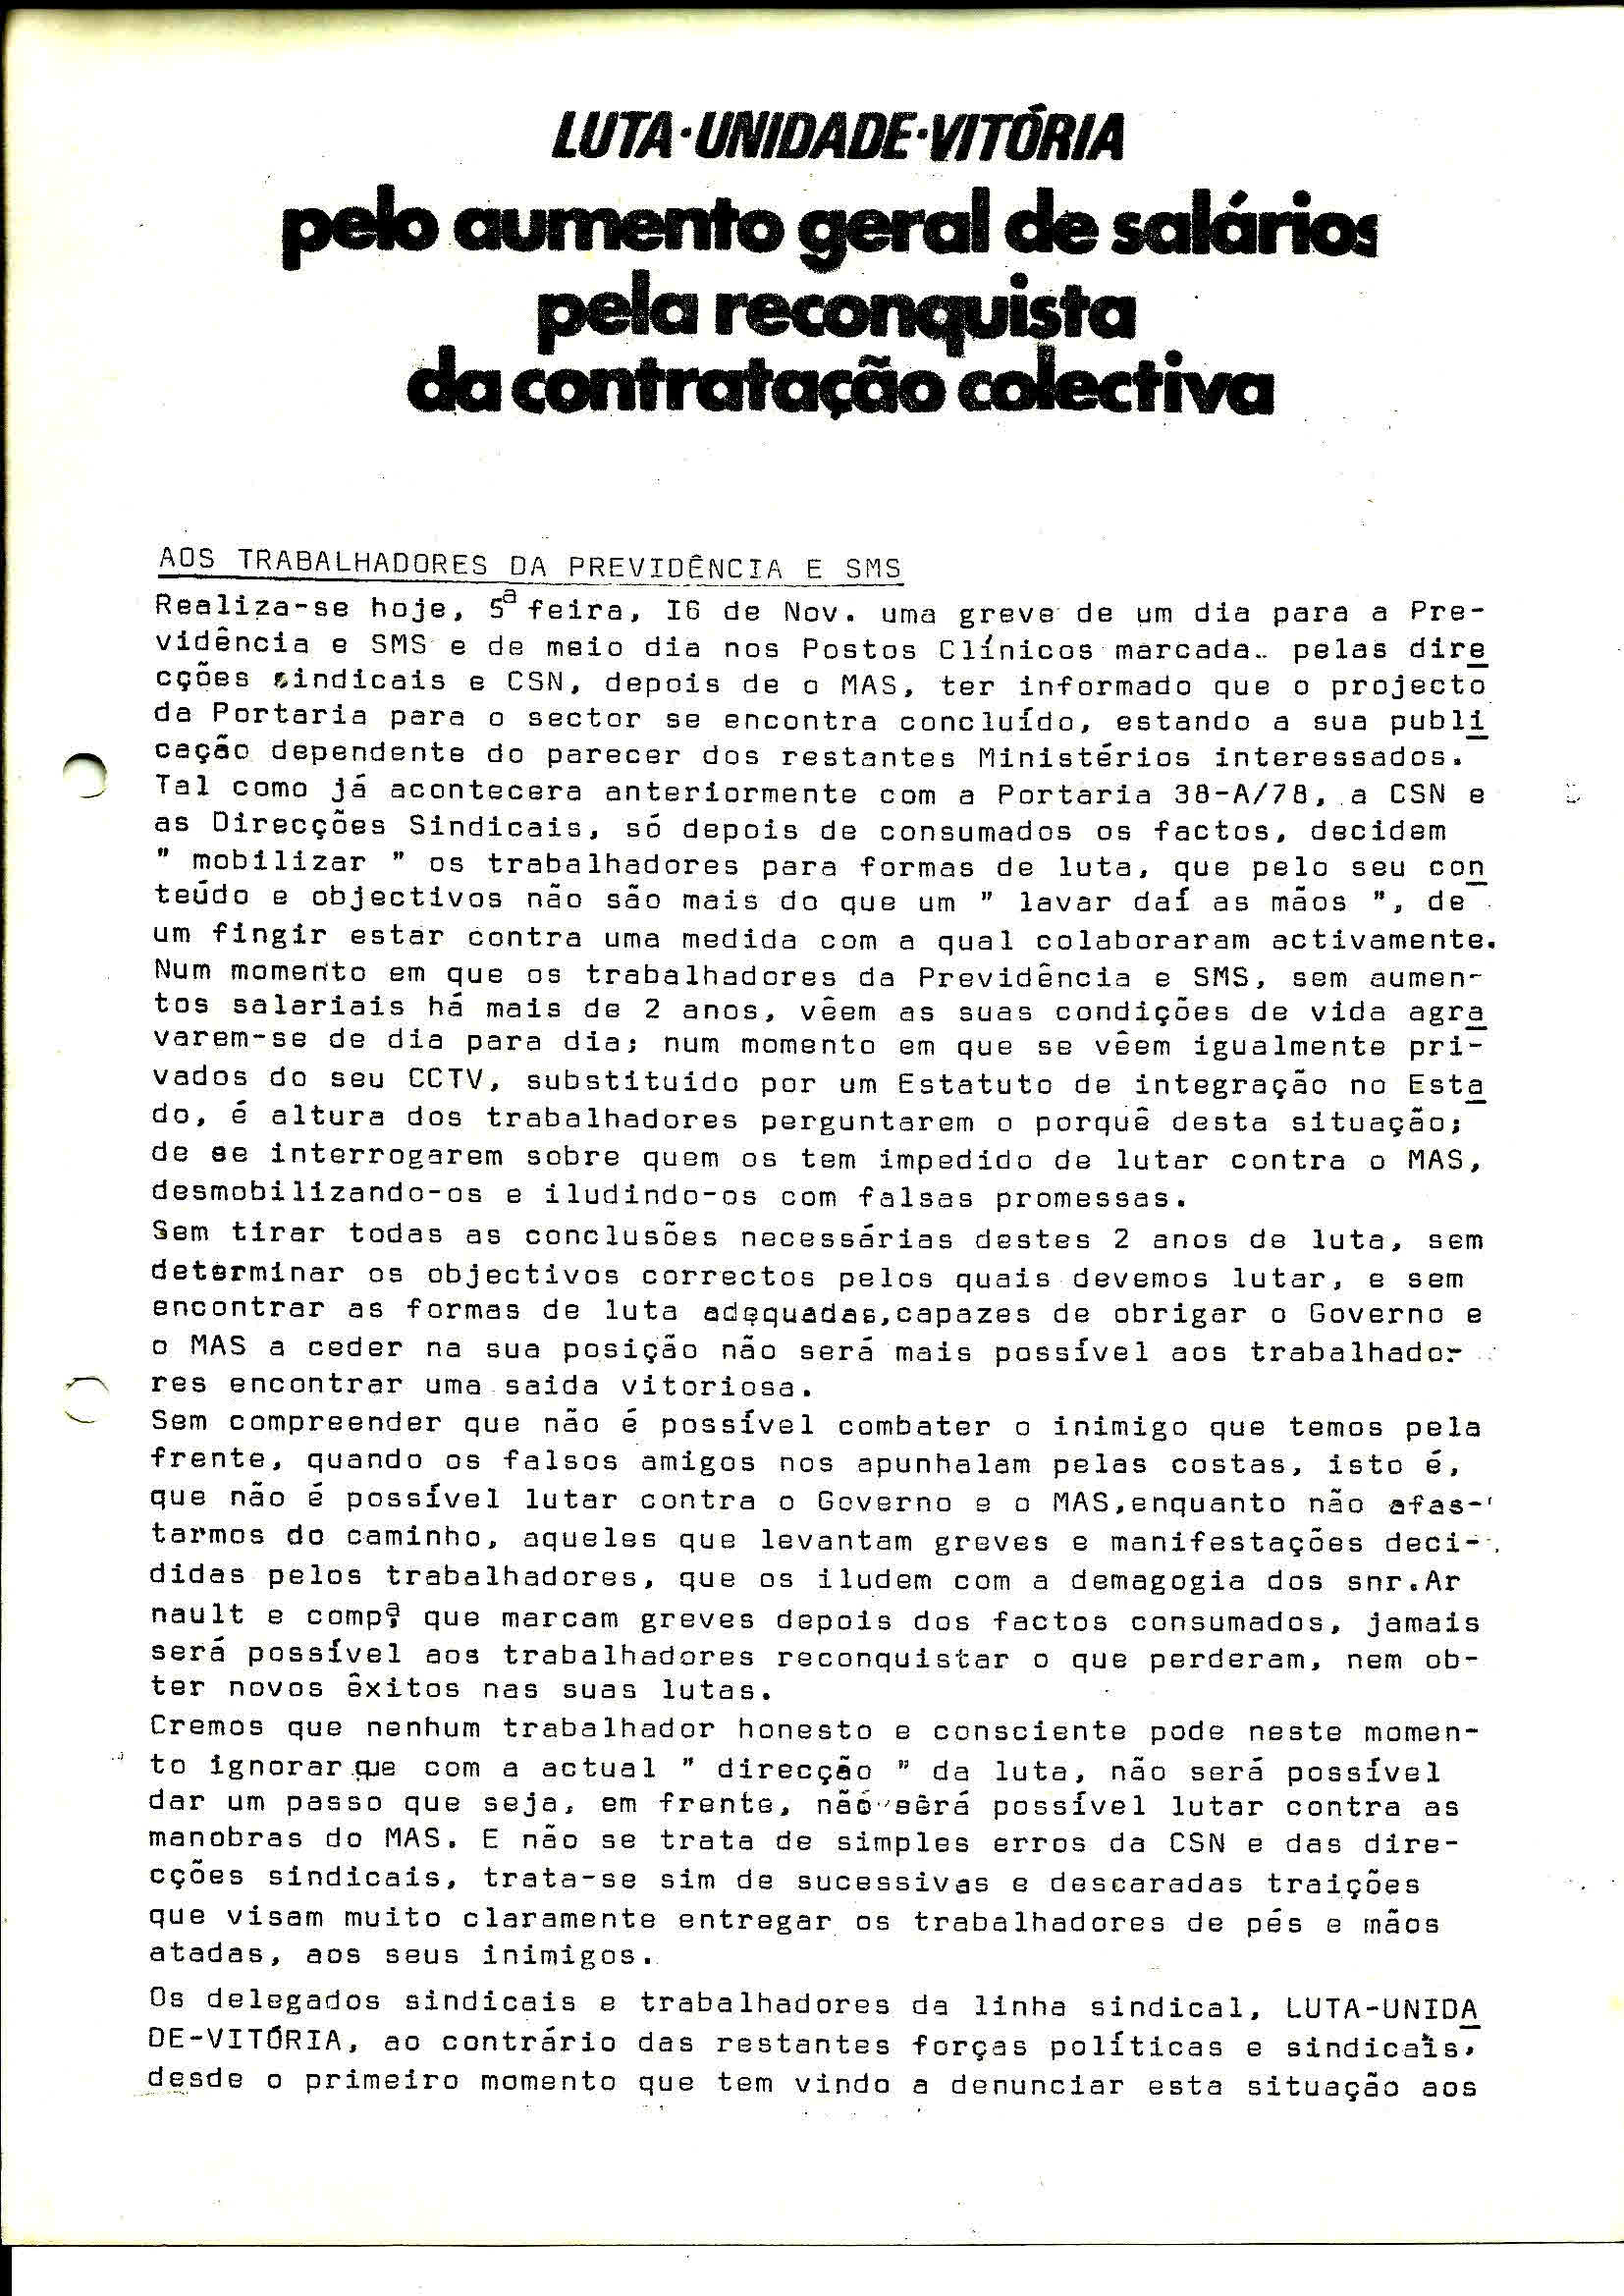 3 Sind Trab Previdência Aumento Salários Novembro 1978 1